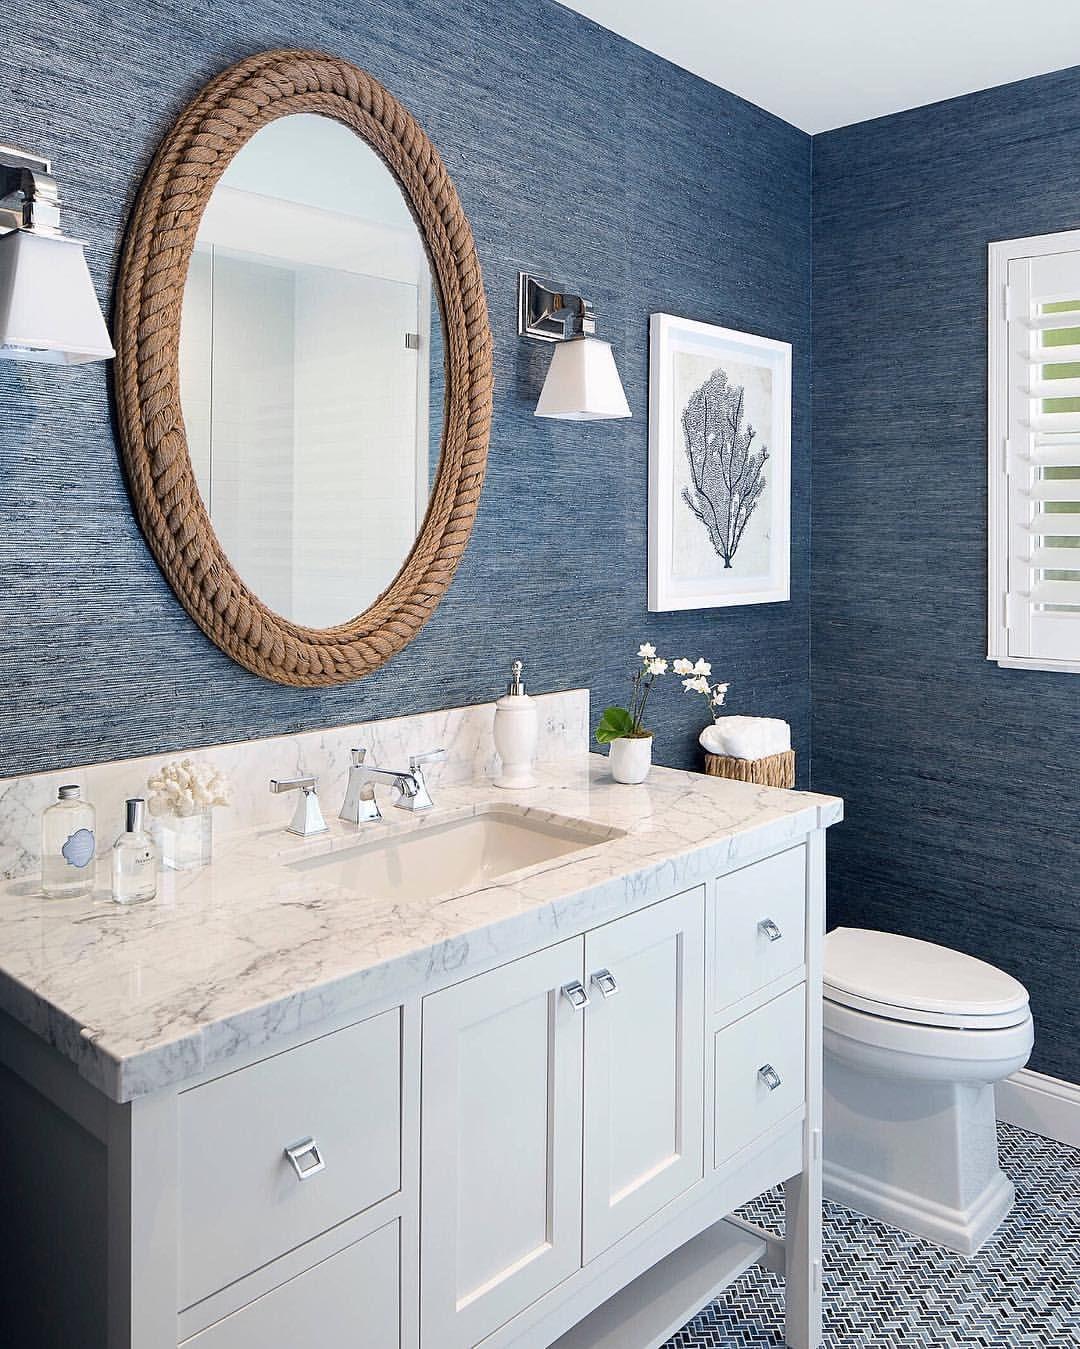 Pin By Write Shoot On Home Design Beach House Bathroom Bathroom